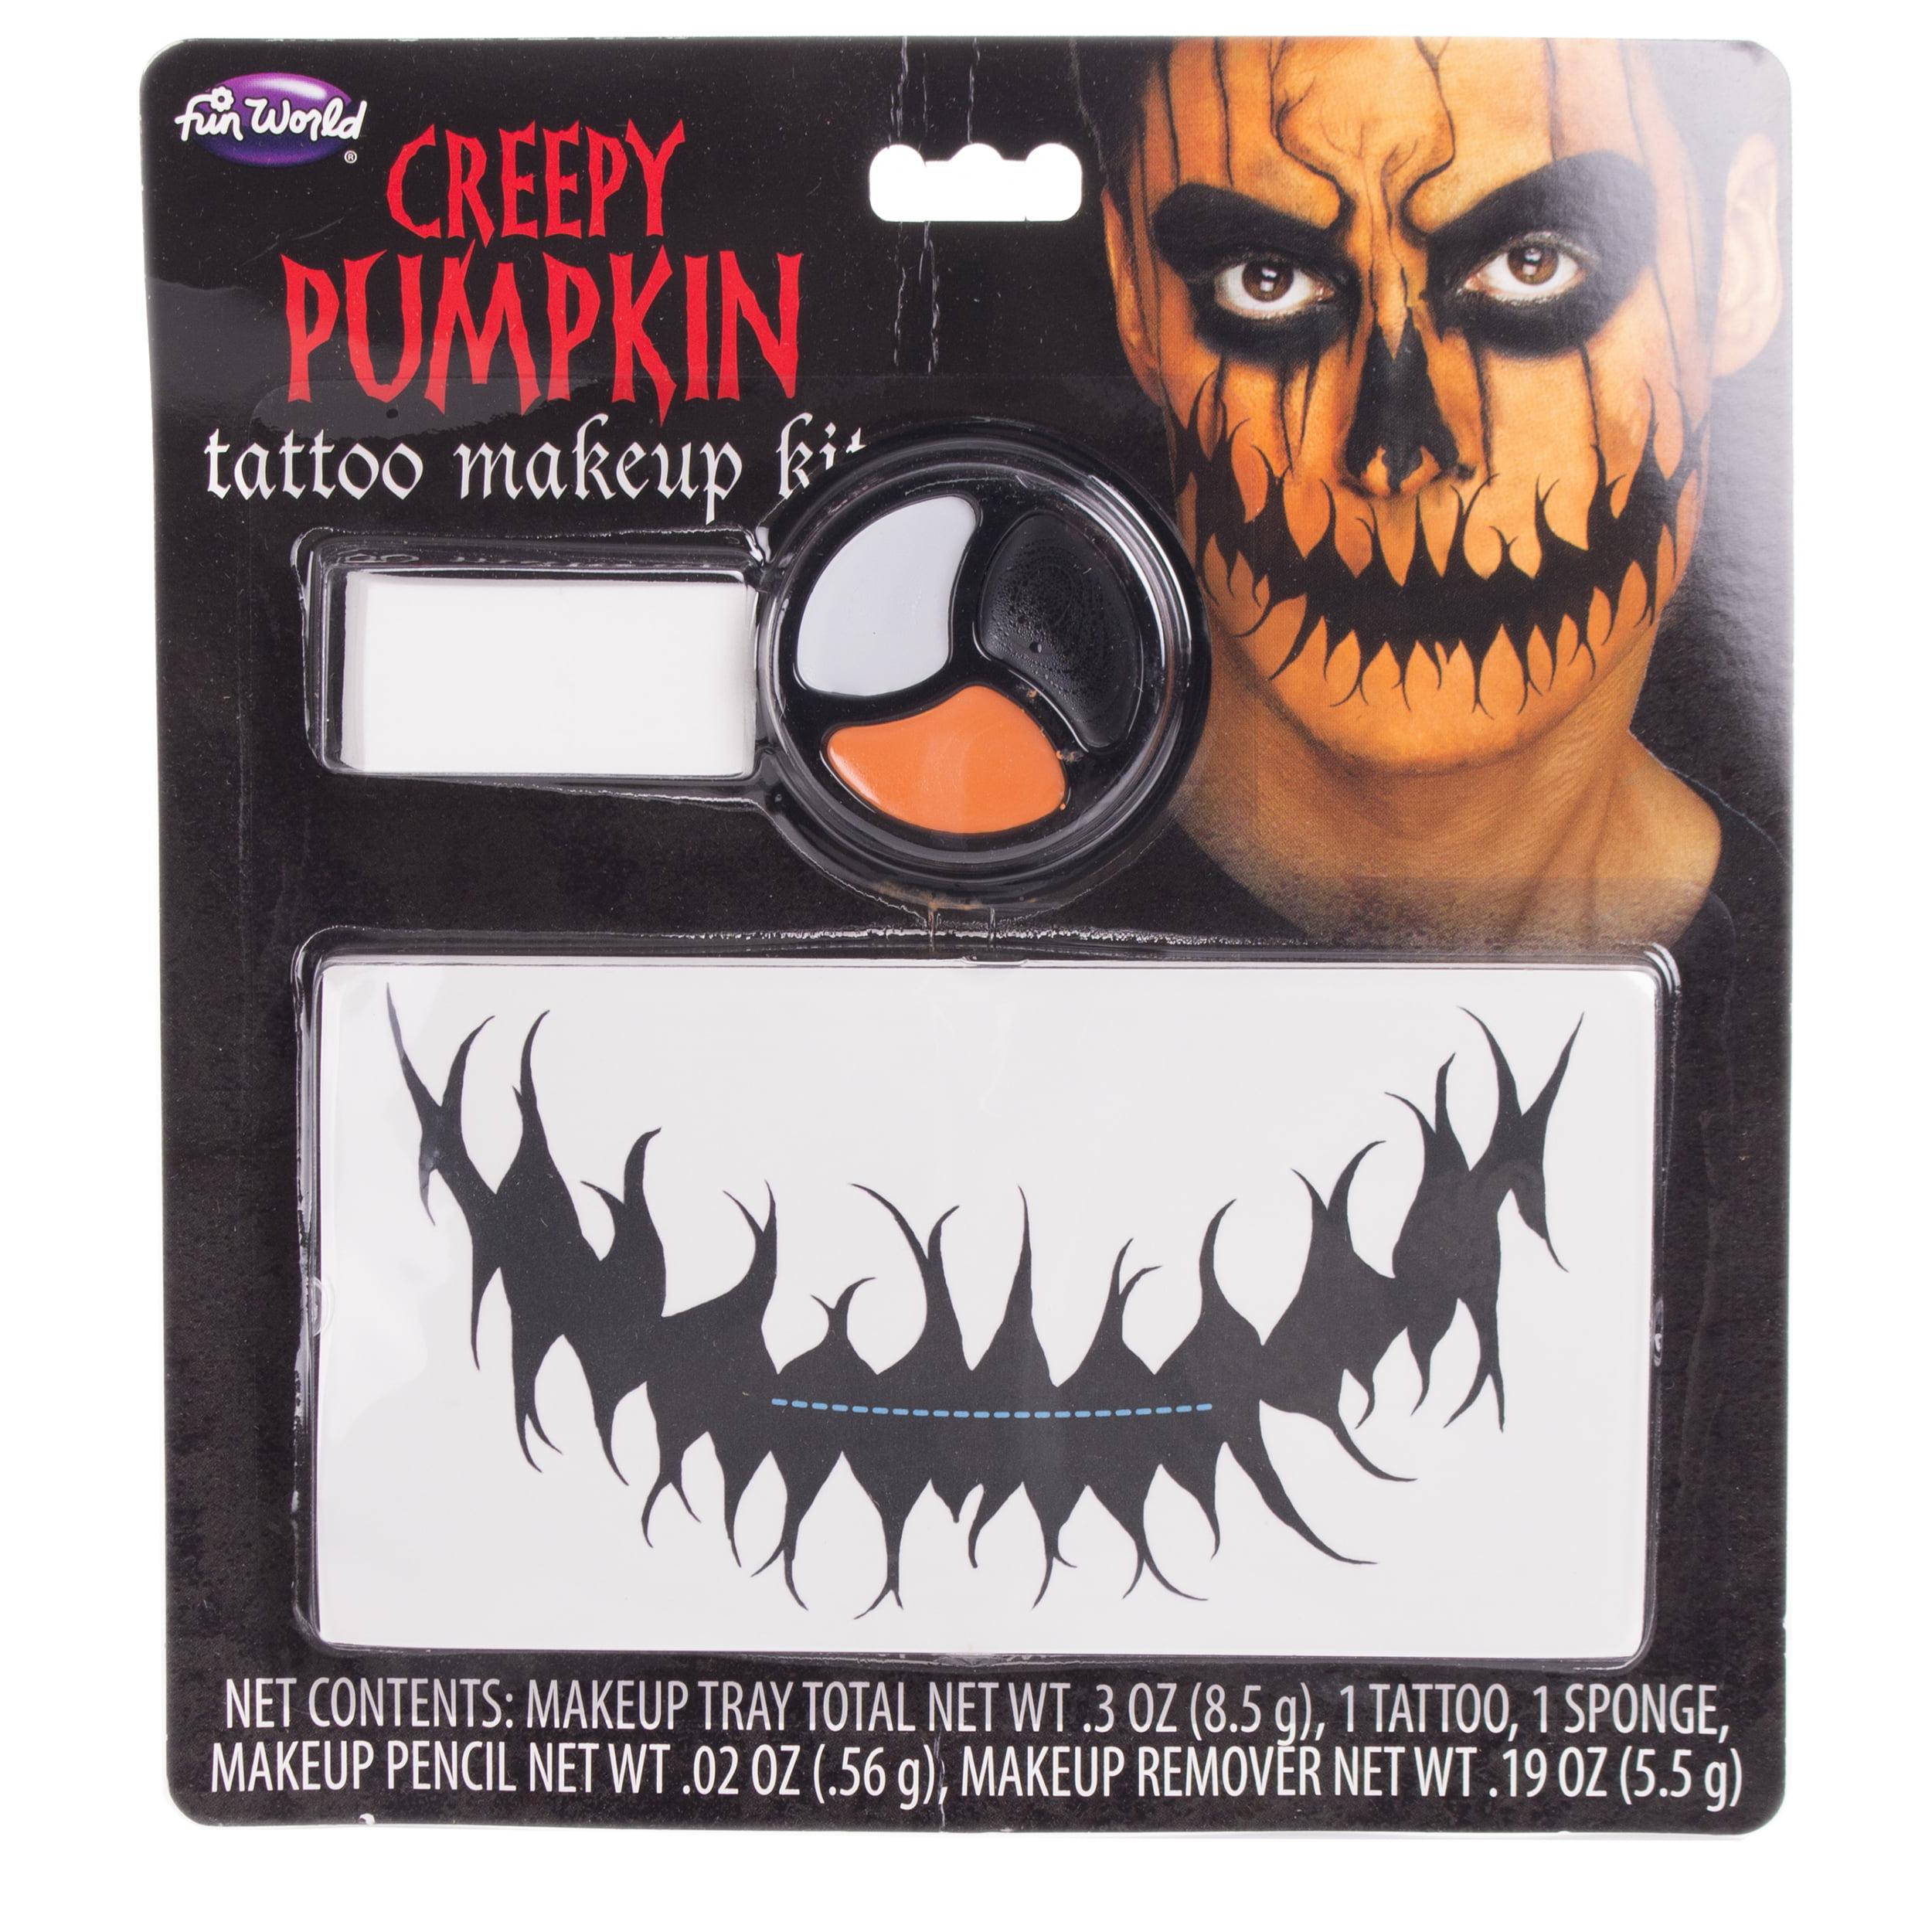 Fun World Speak No Evil Temporary Tattoo 5pc Makeup Kit, .3 oz, Gray Black Red